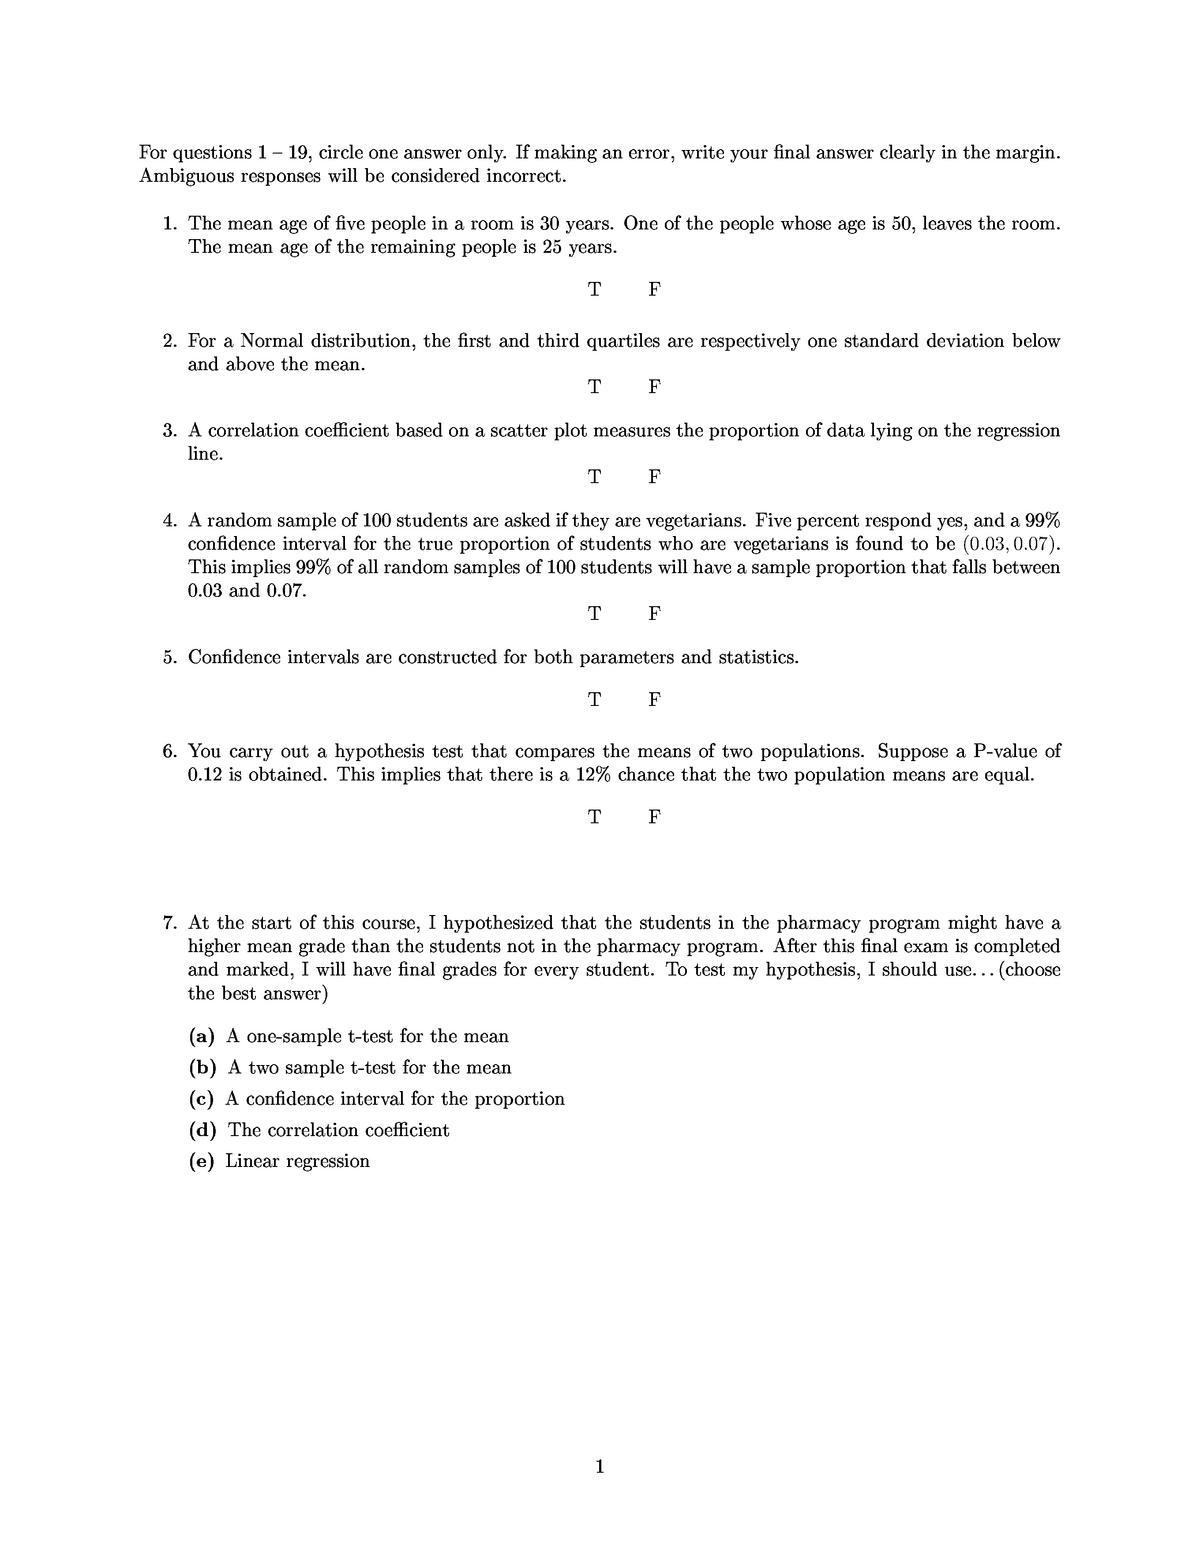 Exam 2018 - STAT 200: Elementary Statistics for Applications - StuDocu